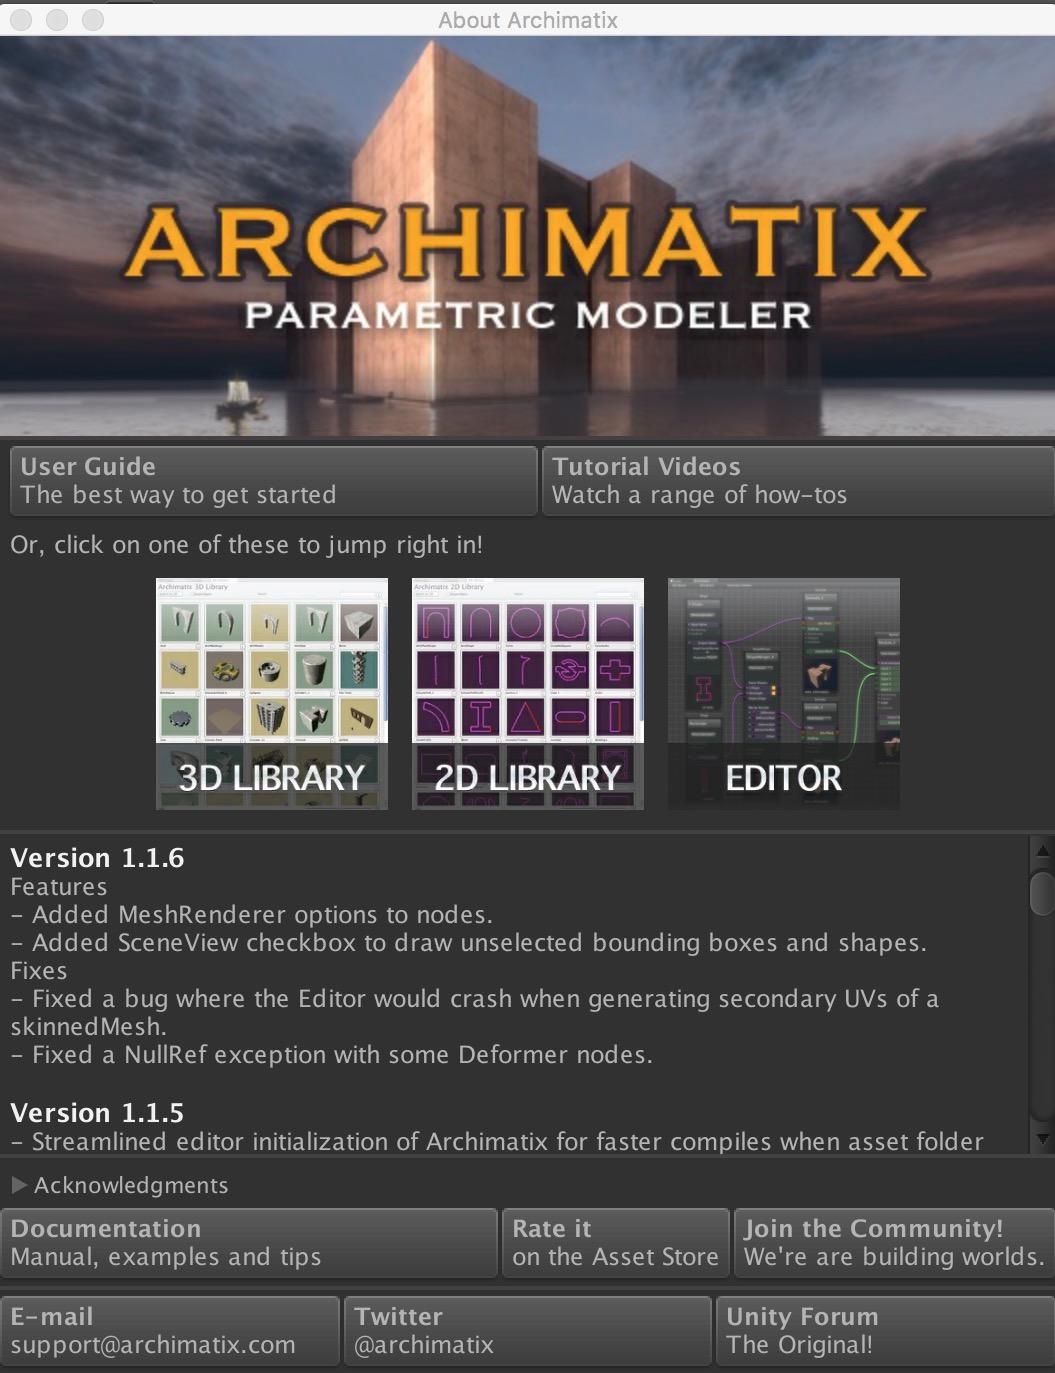 Archimatix 2018-06-19_11-59-42_AM.jpg